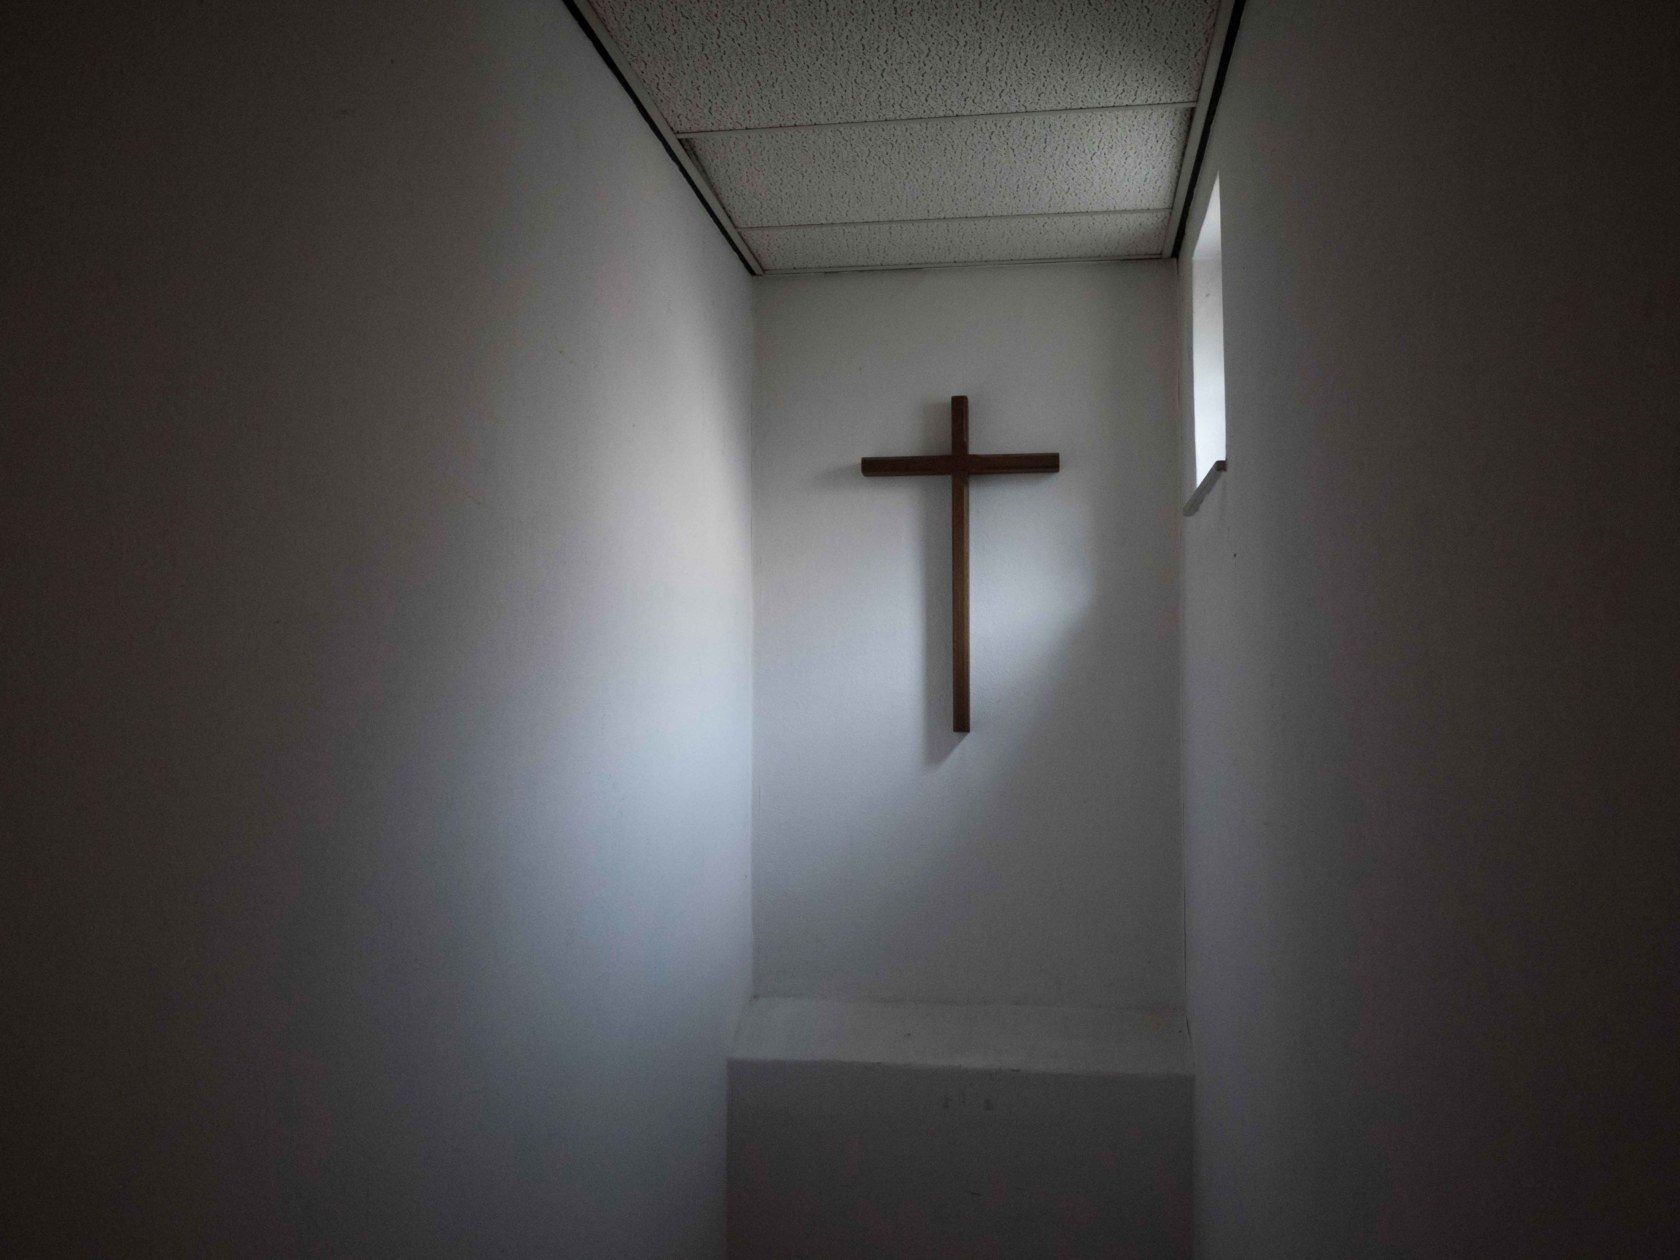 kerkwaterplein-kruis-jasmijn-krol